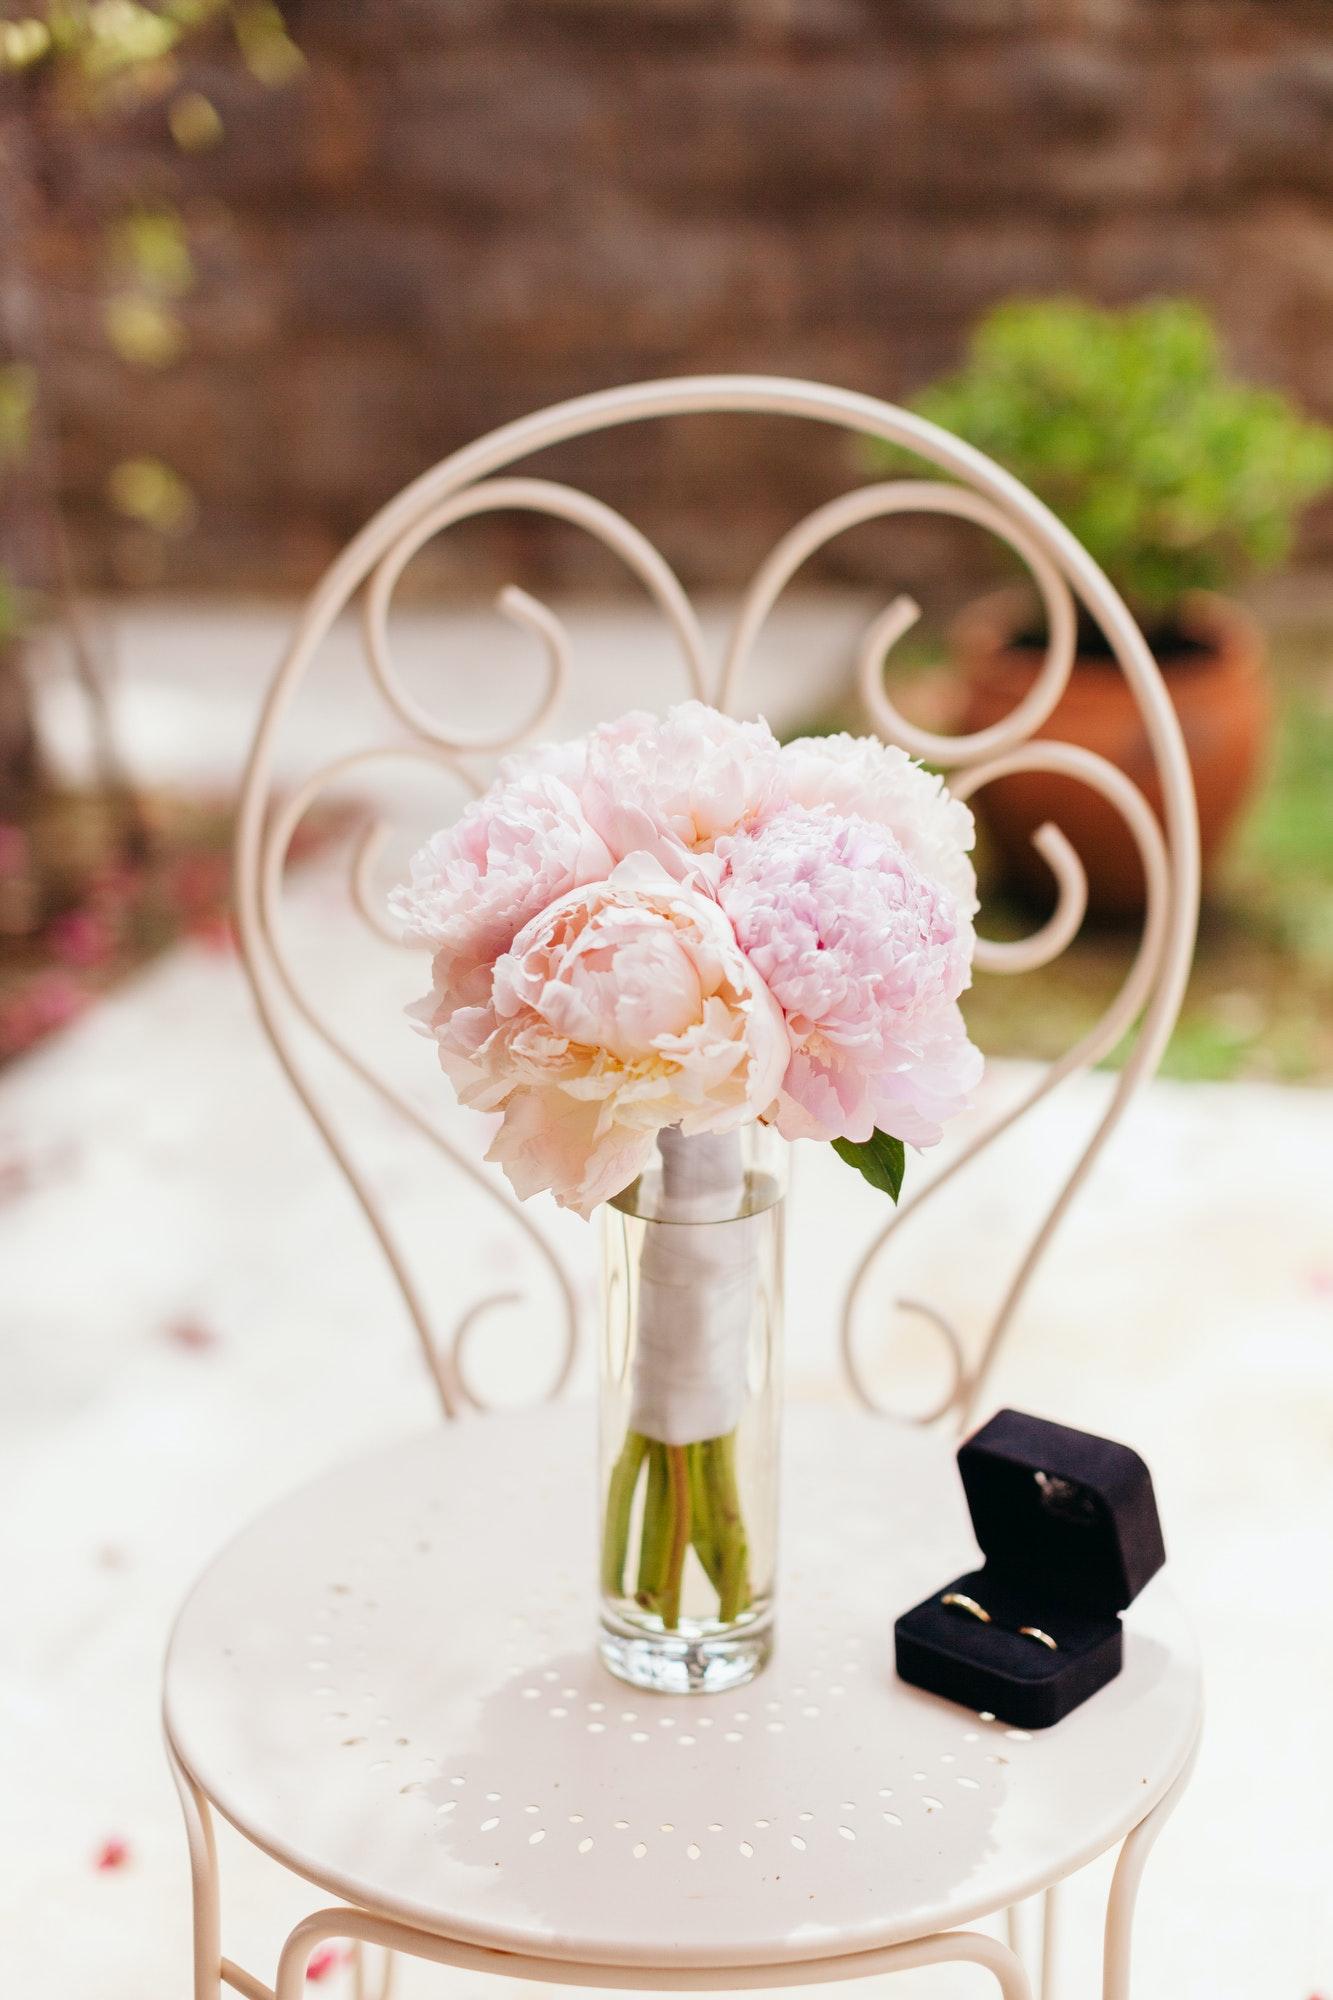 gentle wedding bouquet peonies with rings